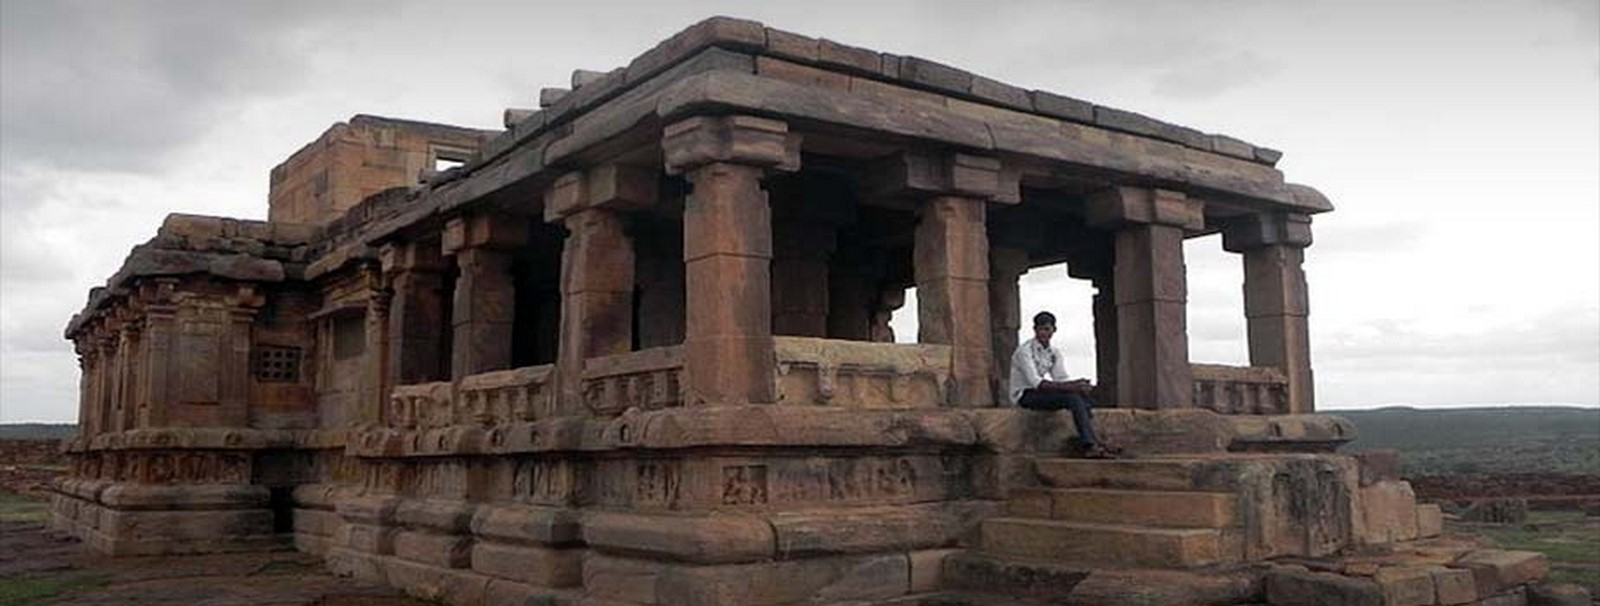 Meganagudi Temple - Sheet2